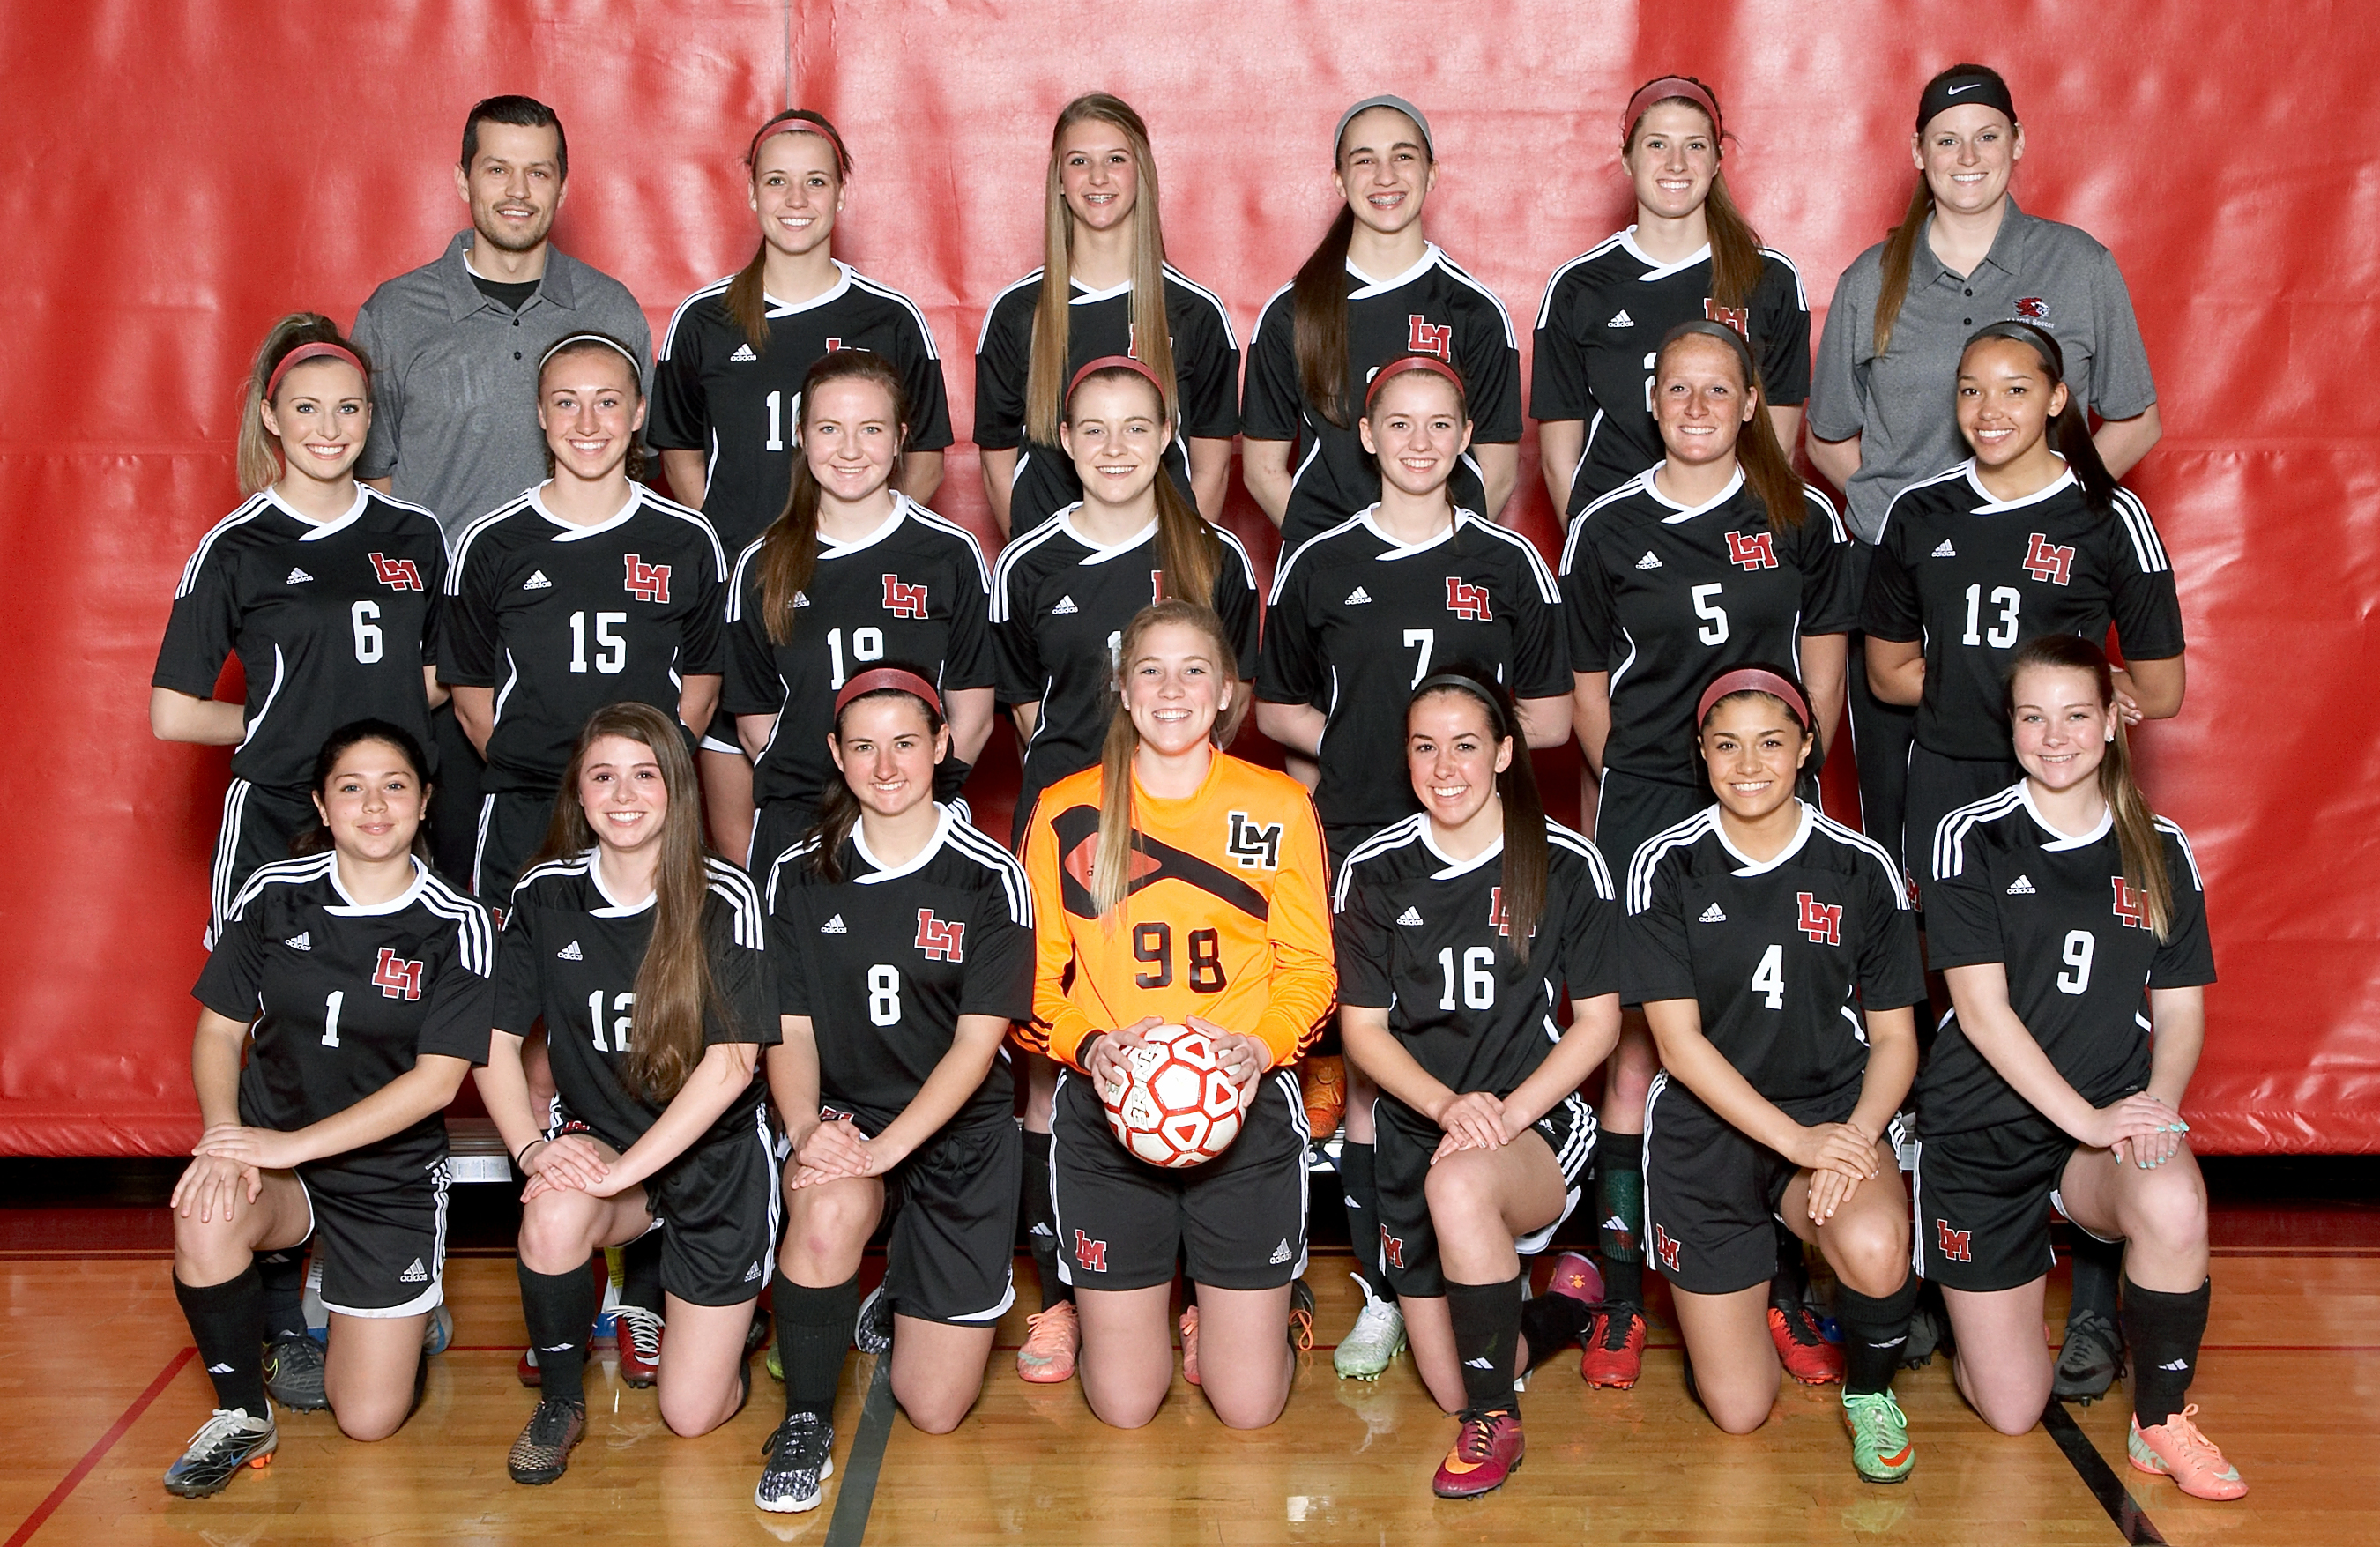 2016 Varsity Team Picture